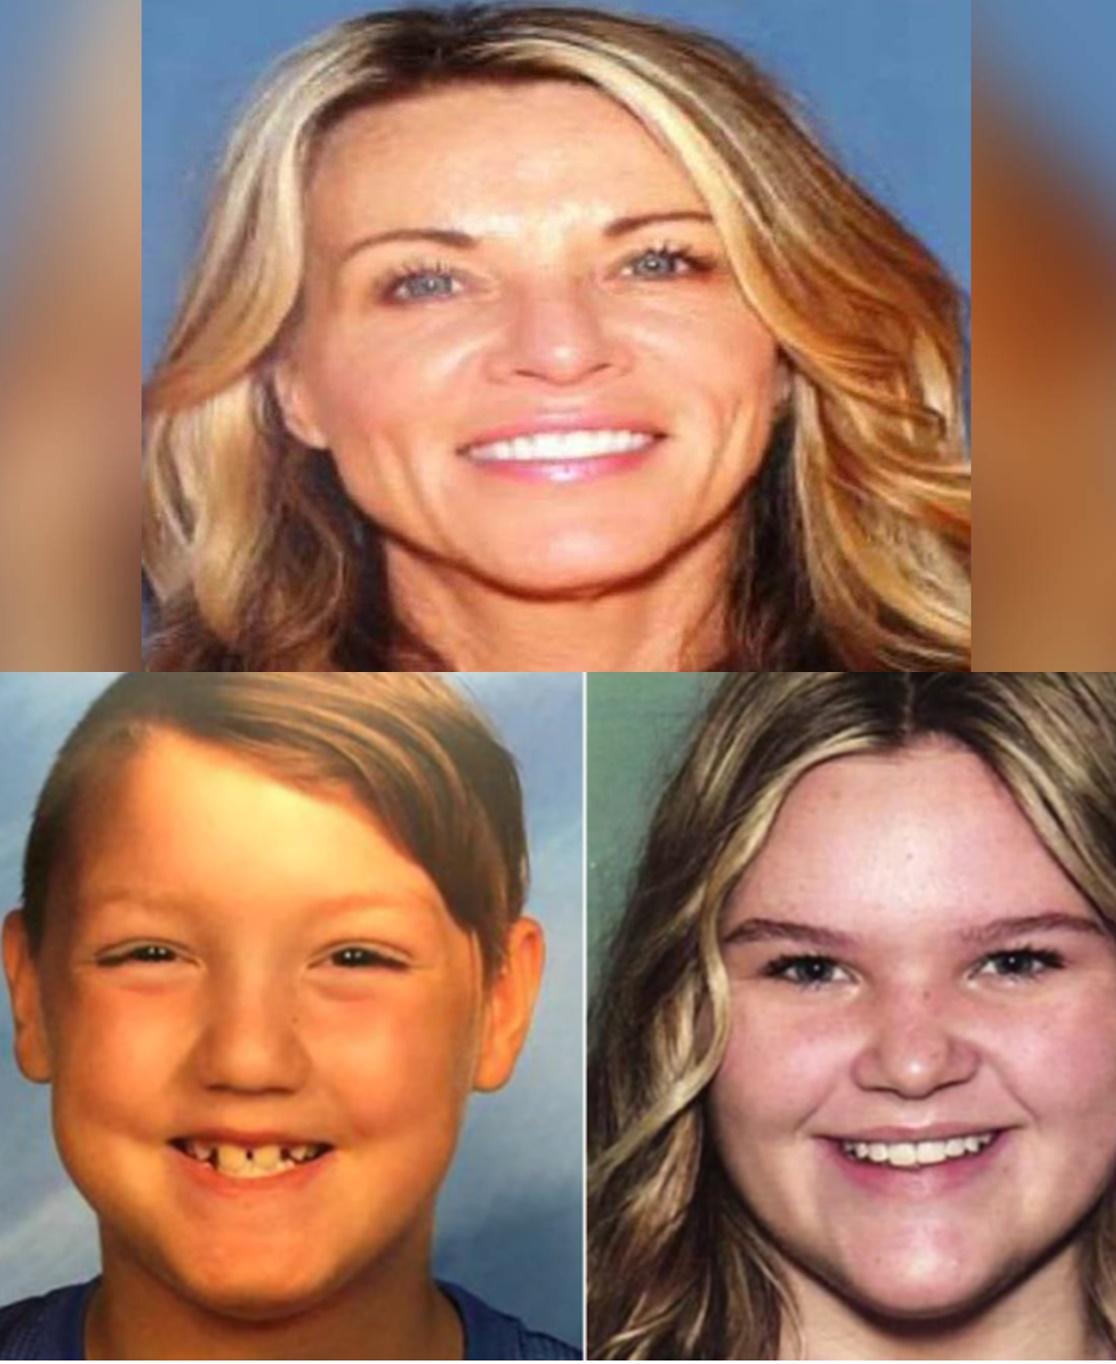 Mom Of Missing Idaho Kids Arrested In Hawaii, Held On $5 Million Bond